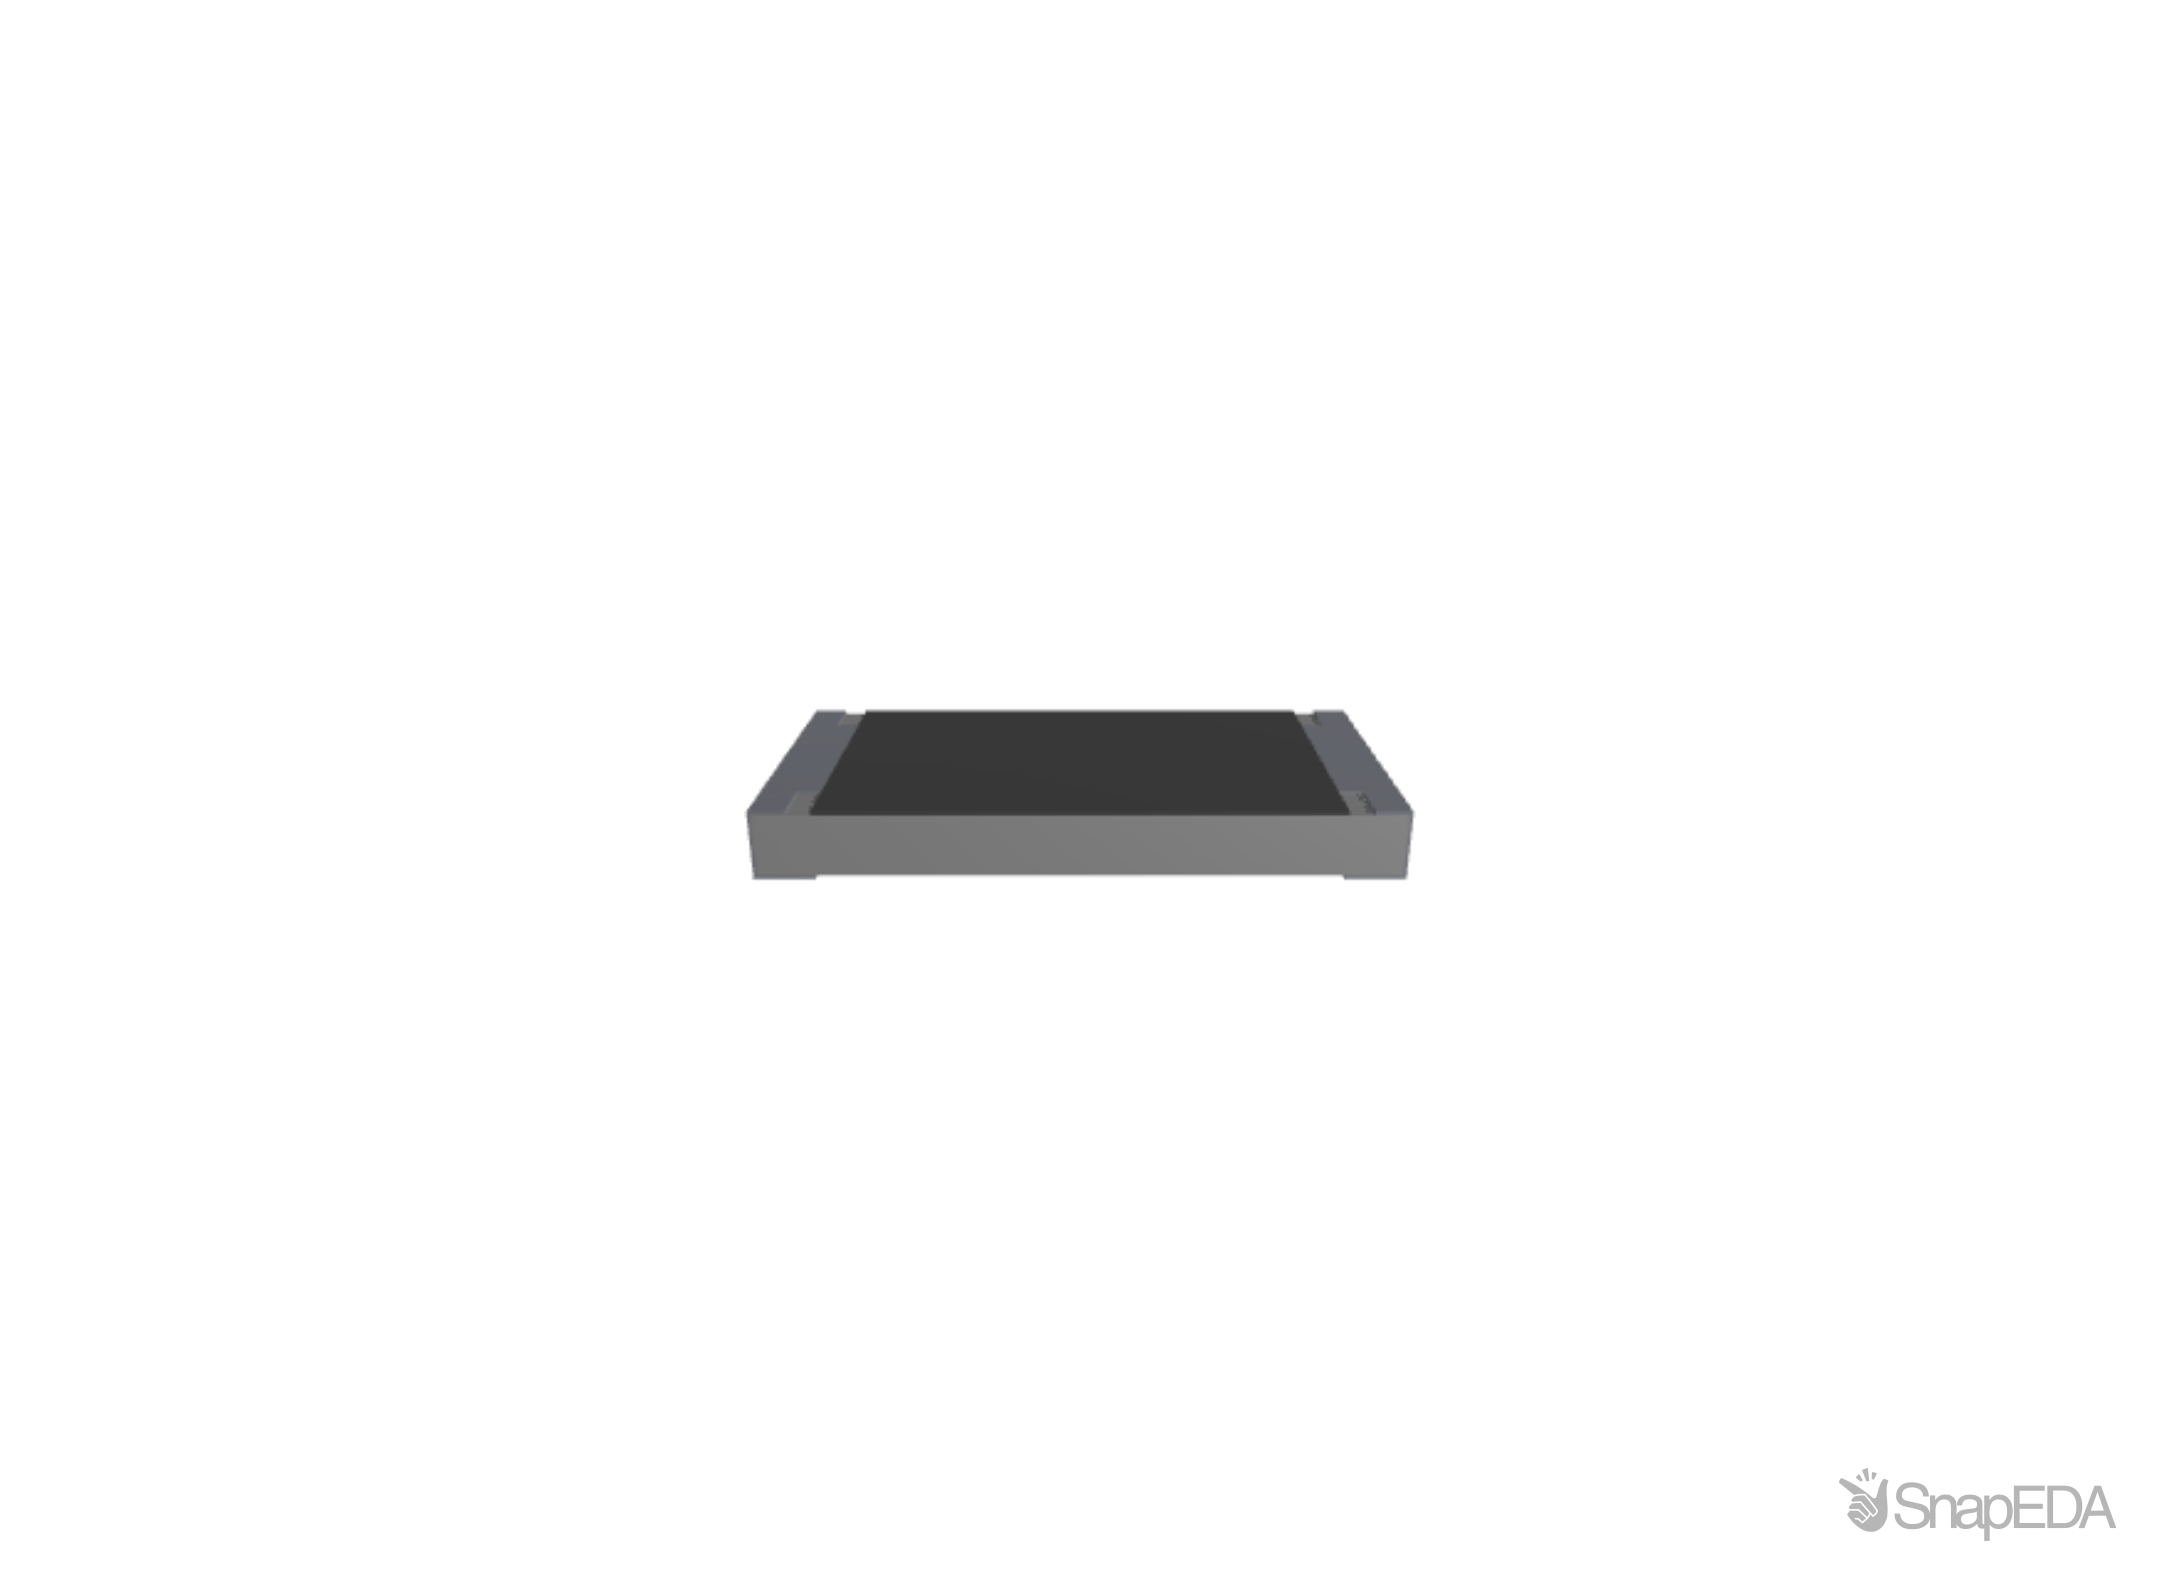 CRCW25121K00FKEG 3D Model